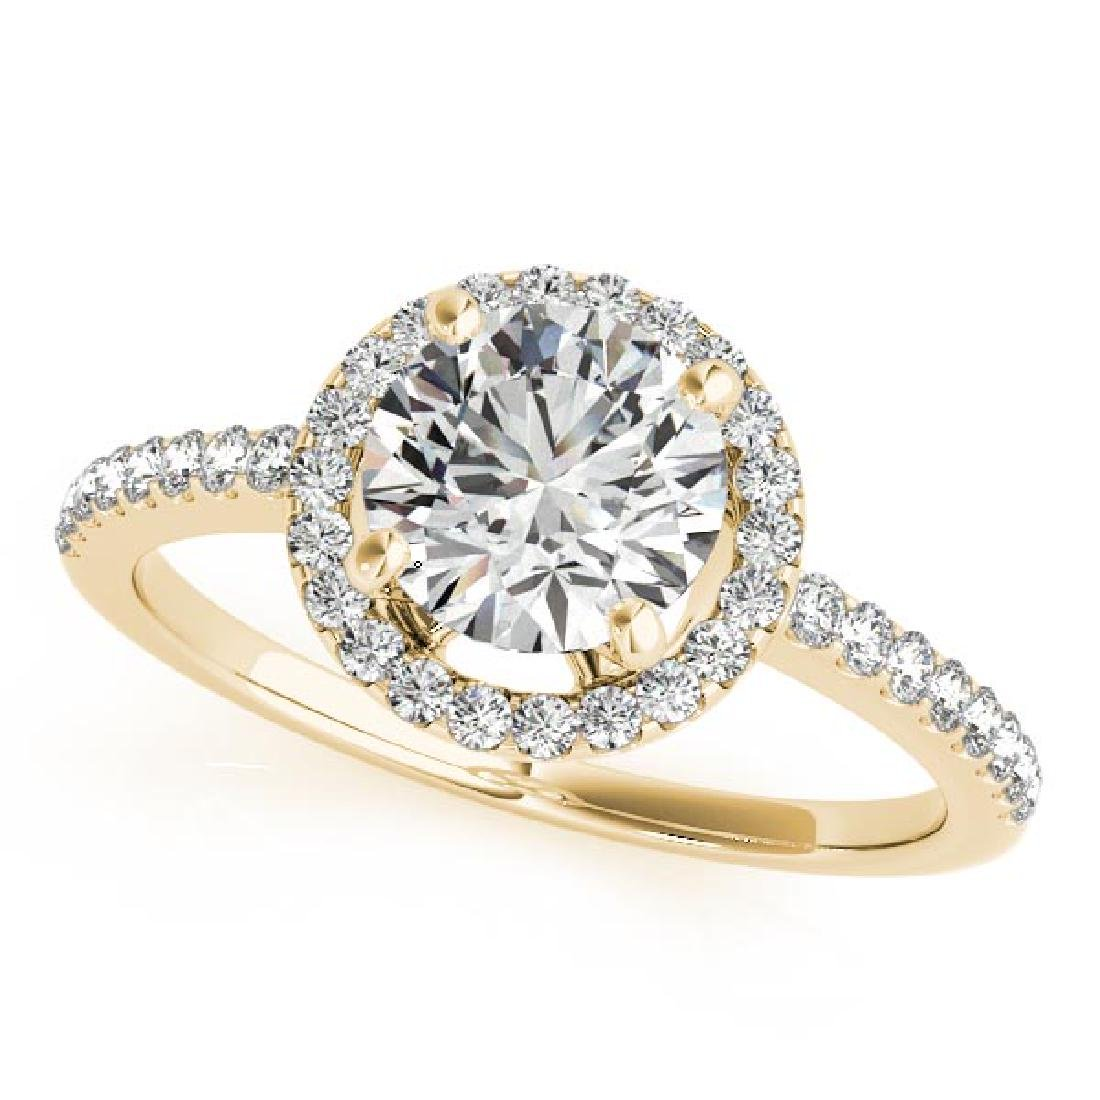 CERTIFIED 18K YELLOW GOLD 1.58 CT G-H/VS-SI1 DIAMOND HA